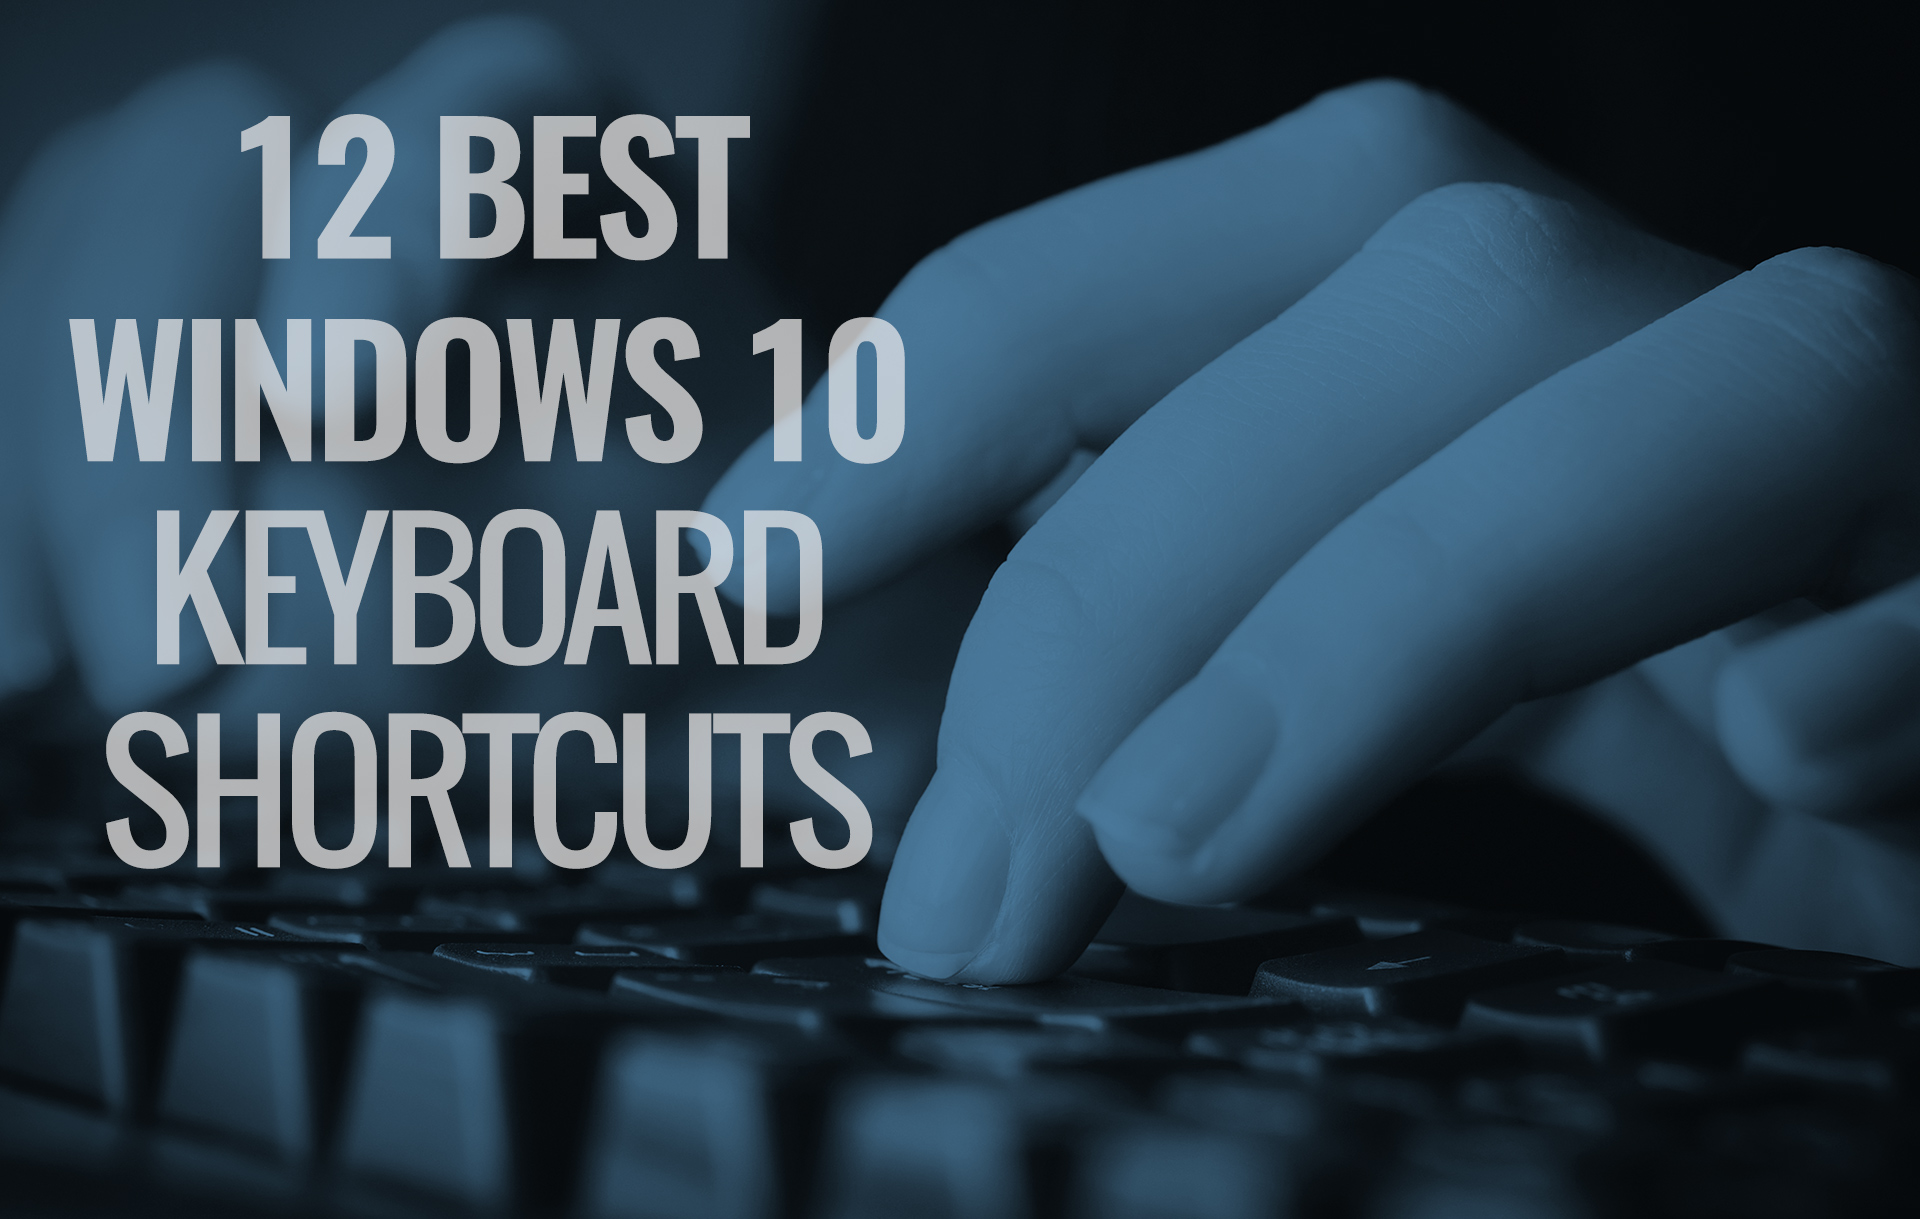 how to delete keyboard windows 10